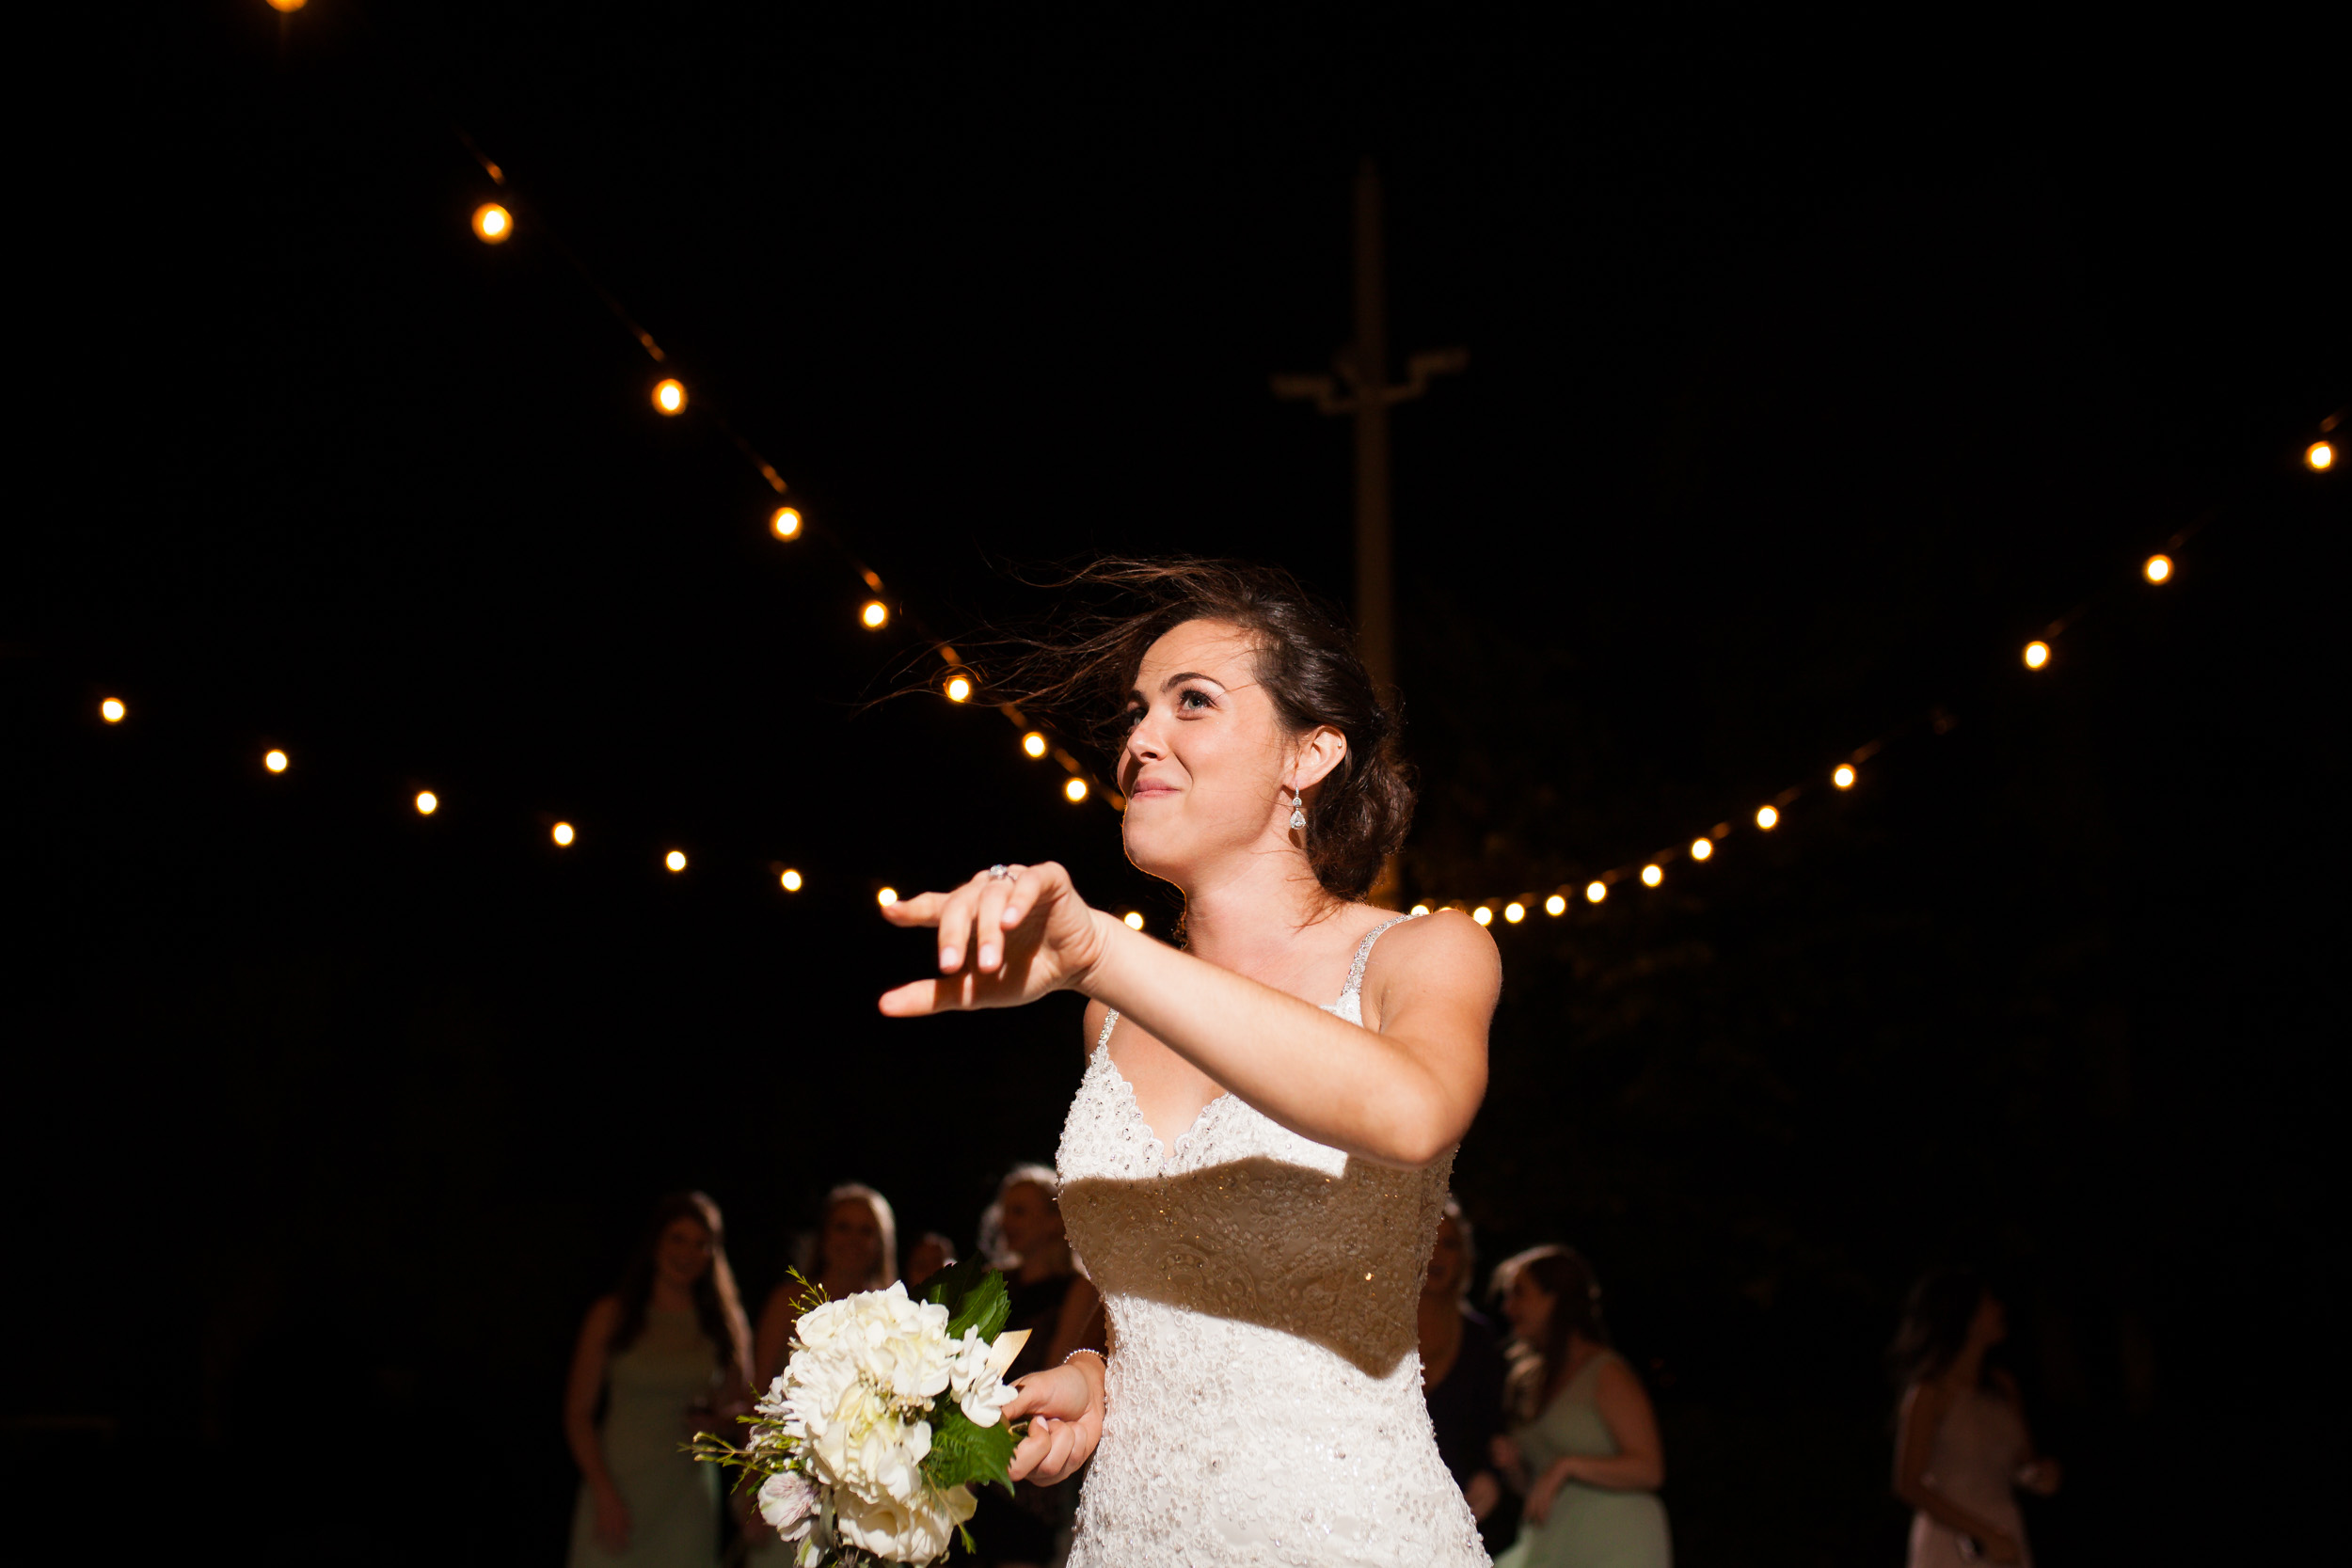 Flordia-Wedding-Photography-77.jpg